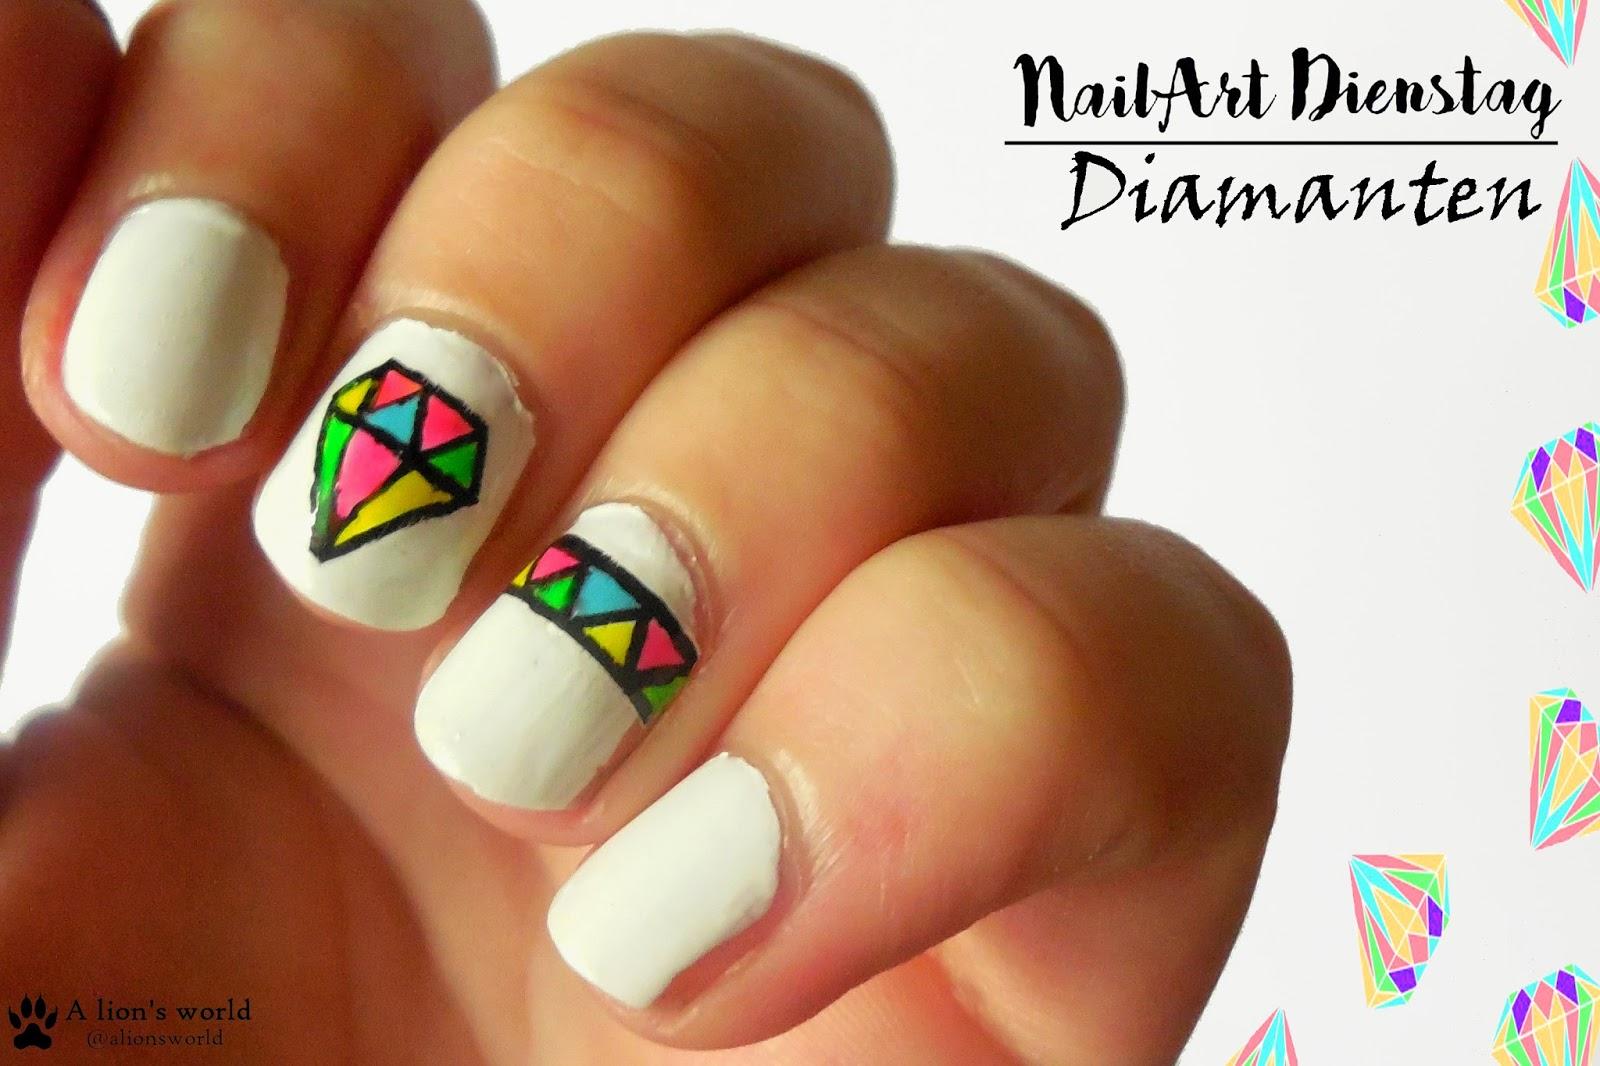 Nailart-Dienstag] Diamanten - alionsworld